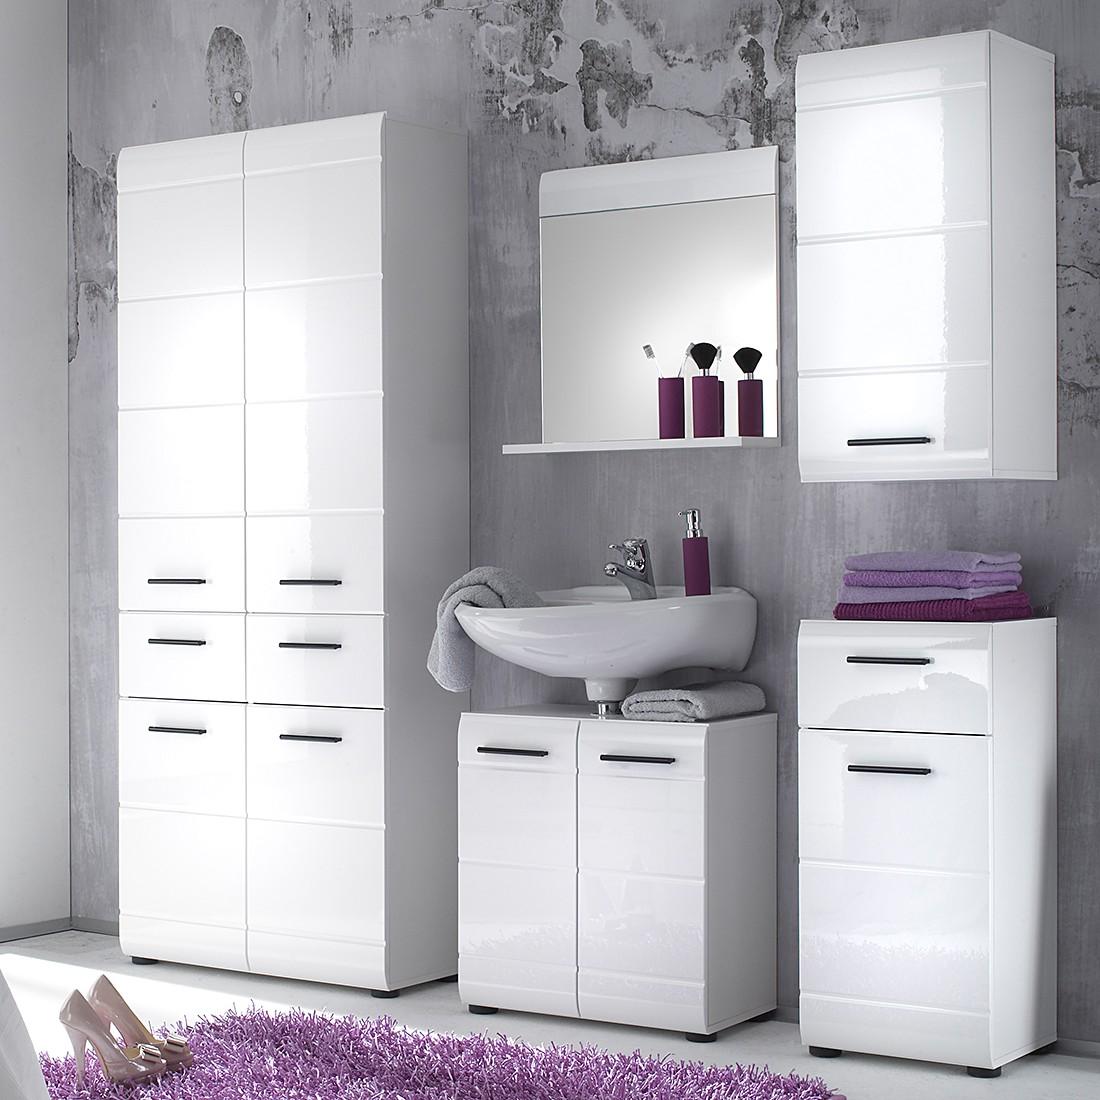 badschrank wei free beautiful full size of badschrank wei. Black Bedroom Furniture Sets. Home Design Ideas